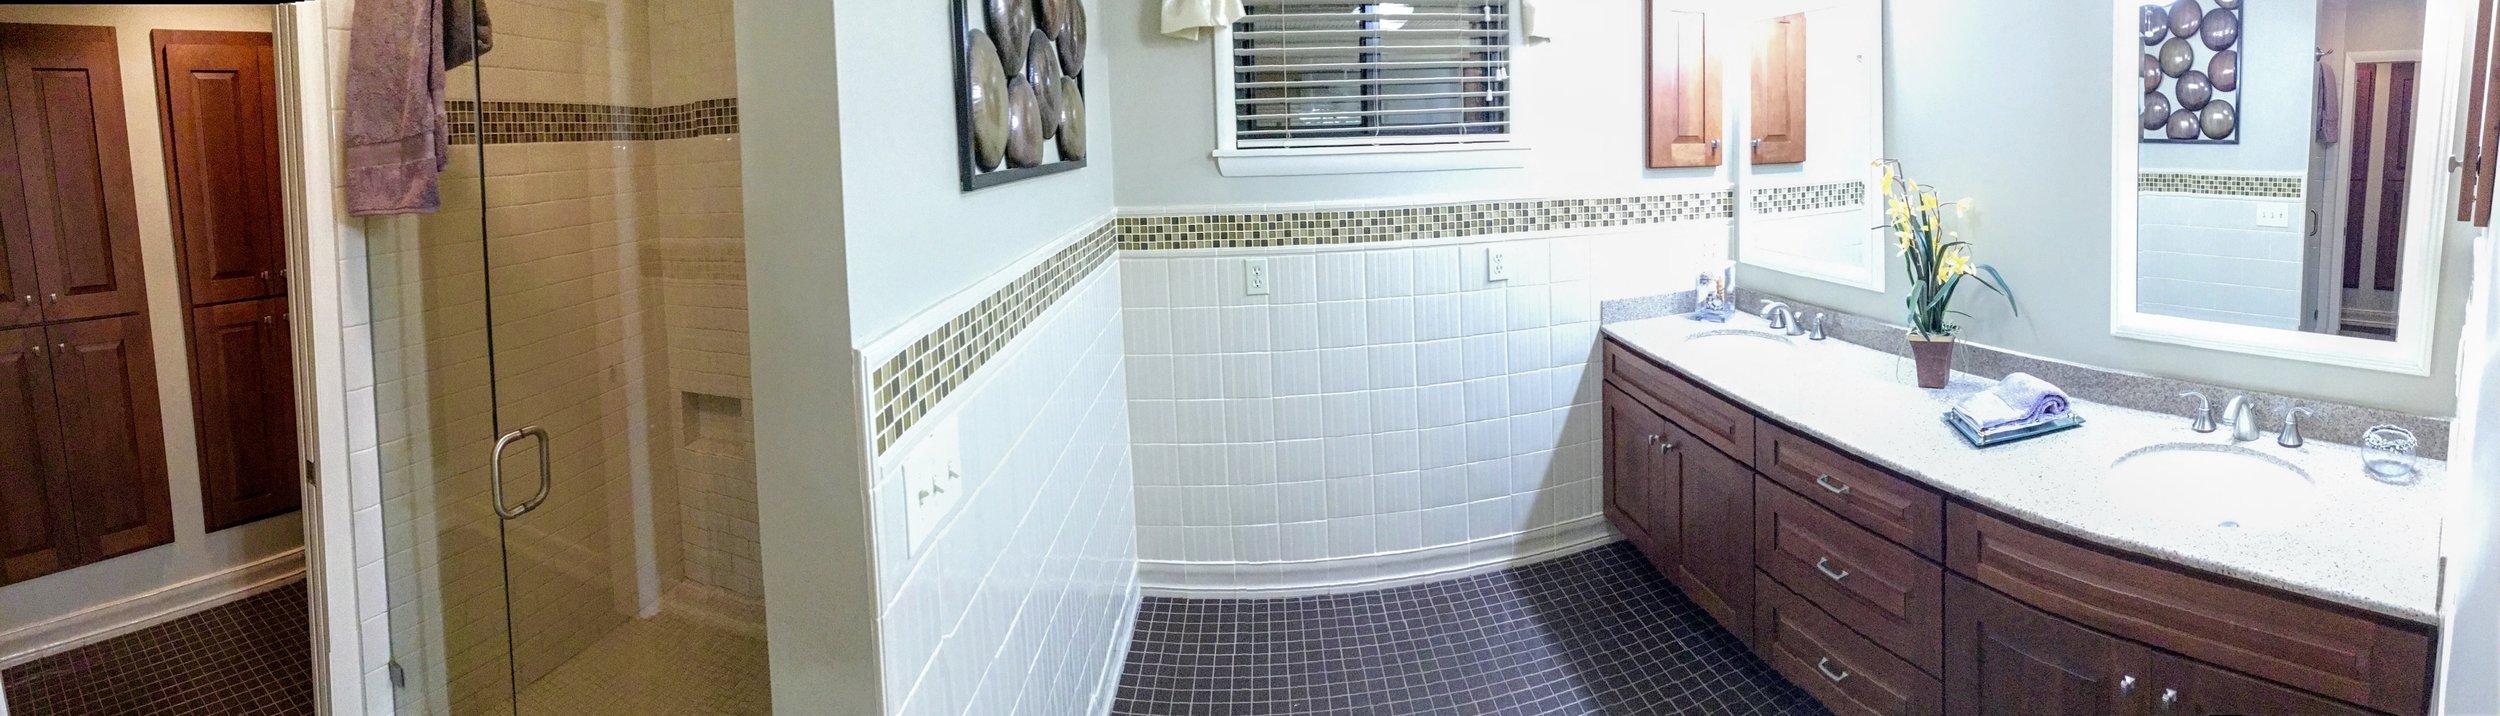 Staging Tulsa - Patrick Henry 4 Bedroom Master Bath.jpg